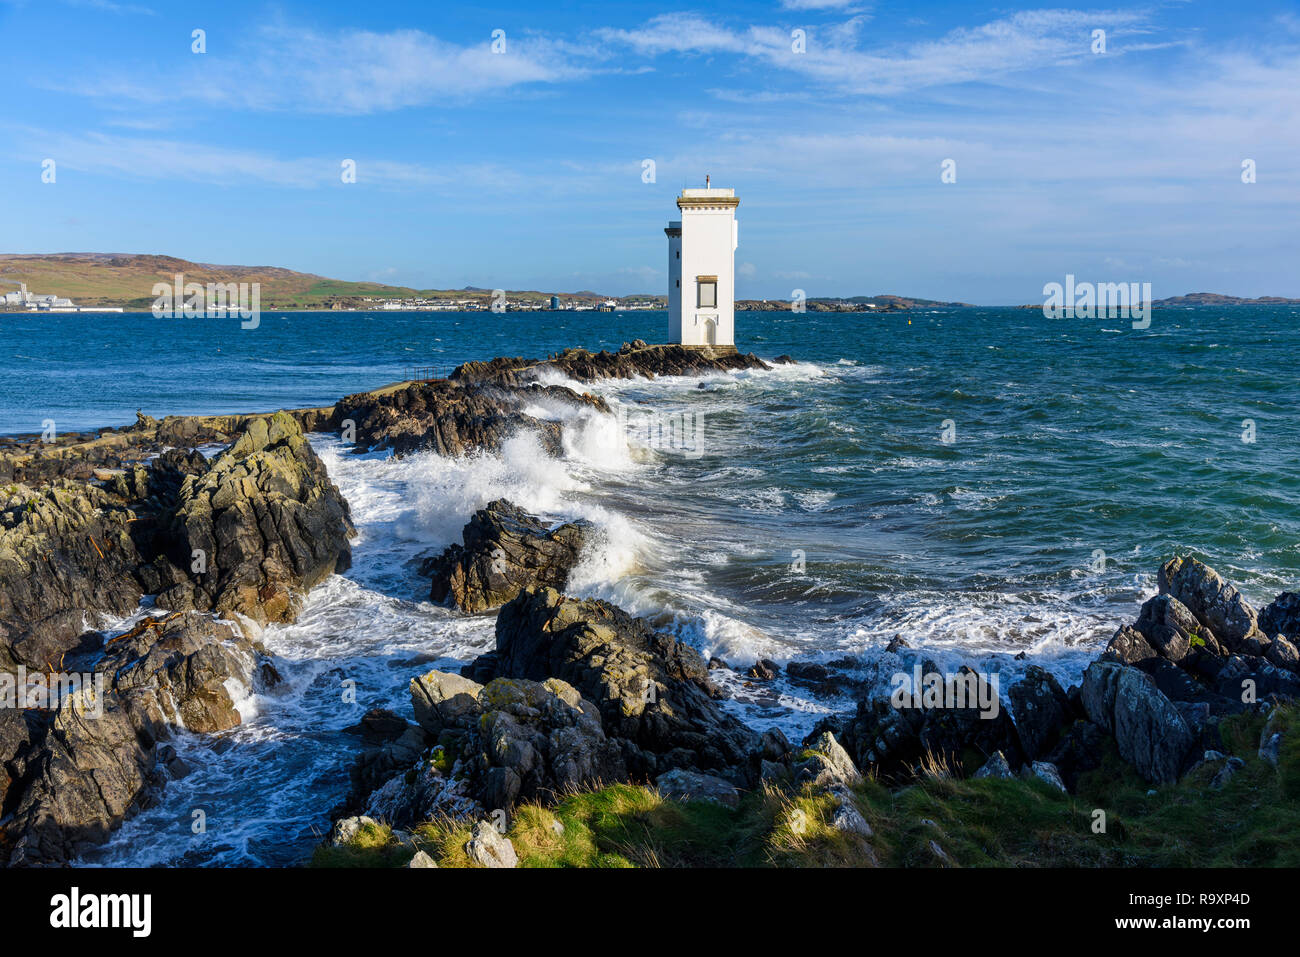 Carraig Fhada lighthouse, near Port Ellen, Islay, Inner Hebrides, Argyll & Bute, Scotland - Stock Image